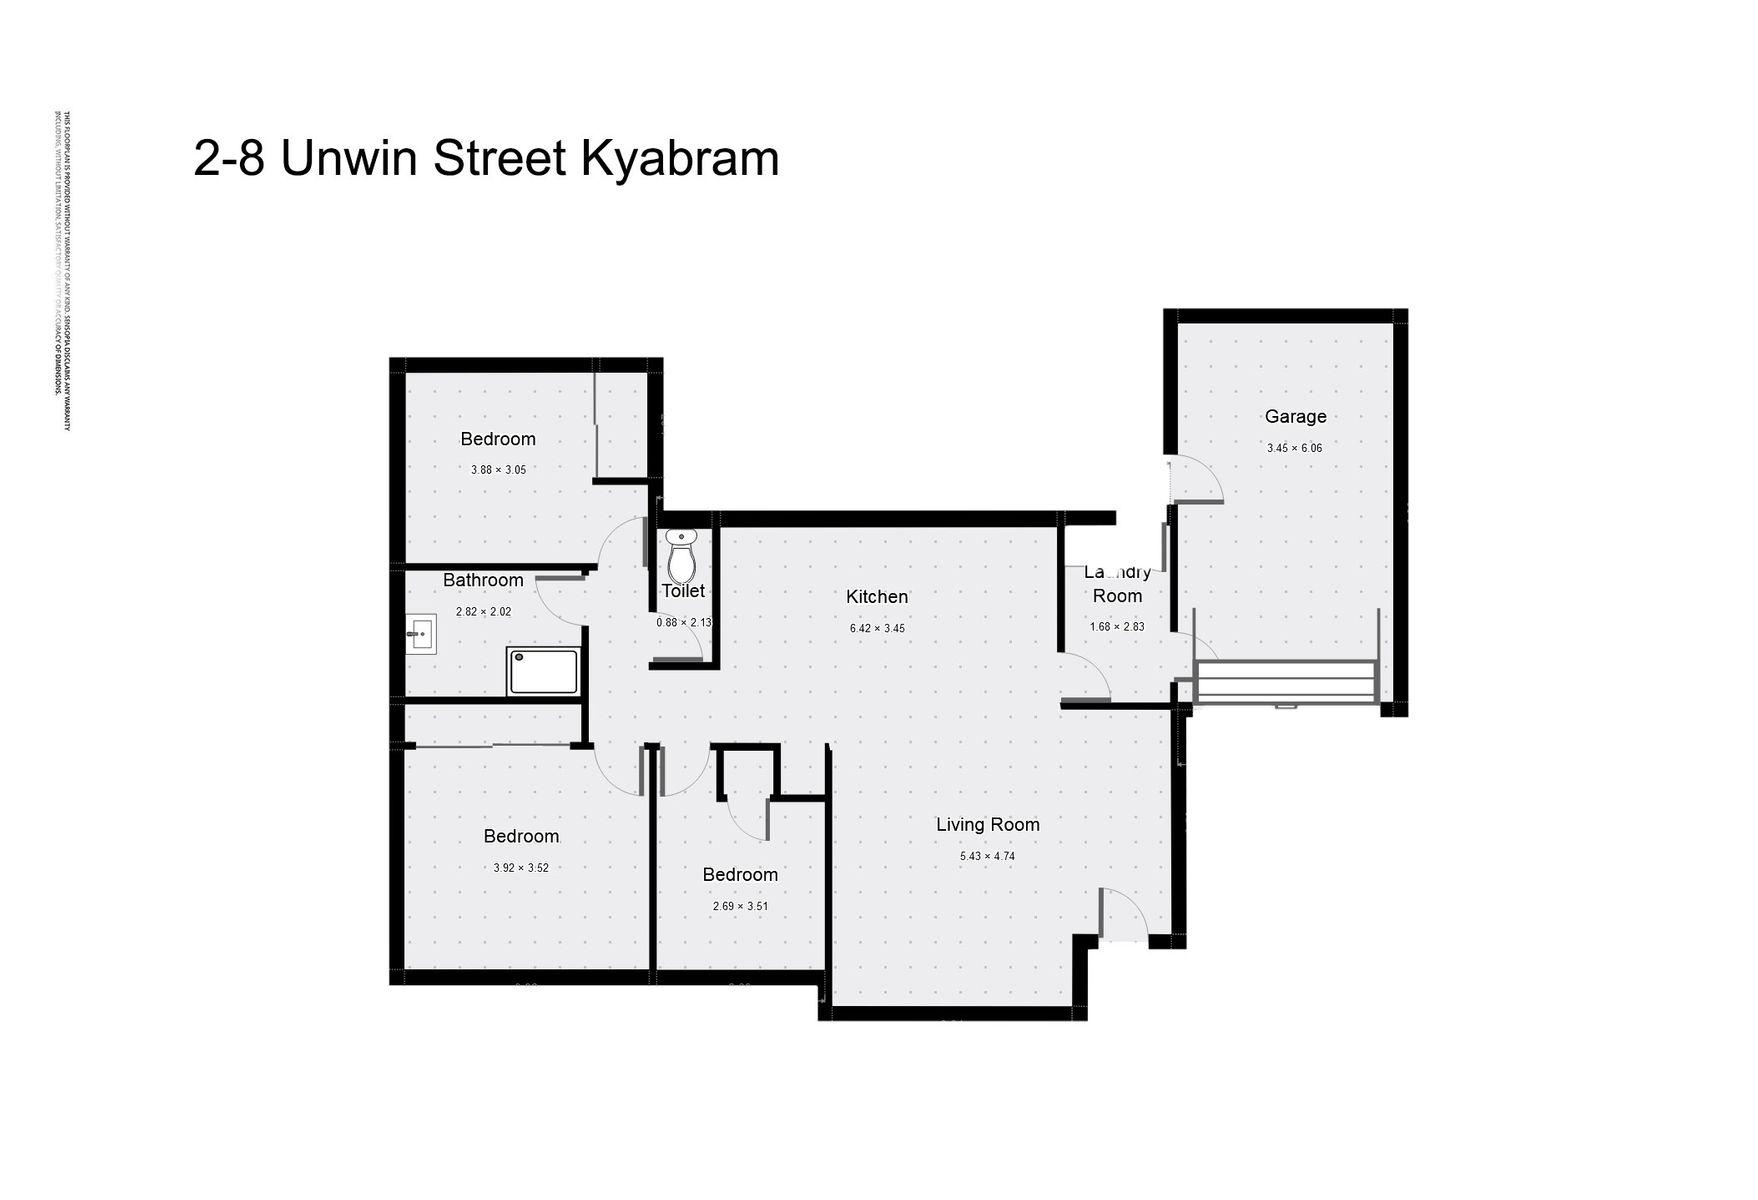 2/8 Unwin Street, Kyabram, VIC 3620